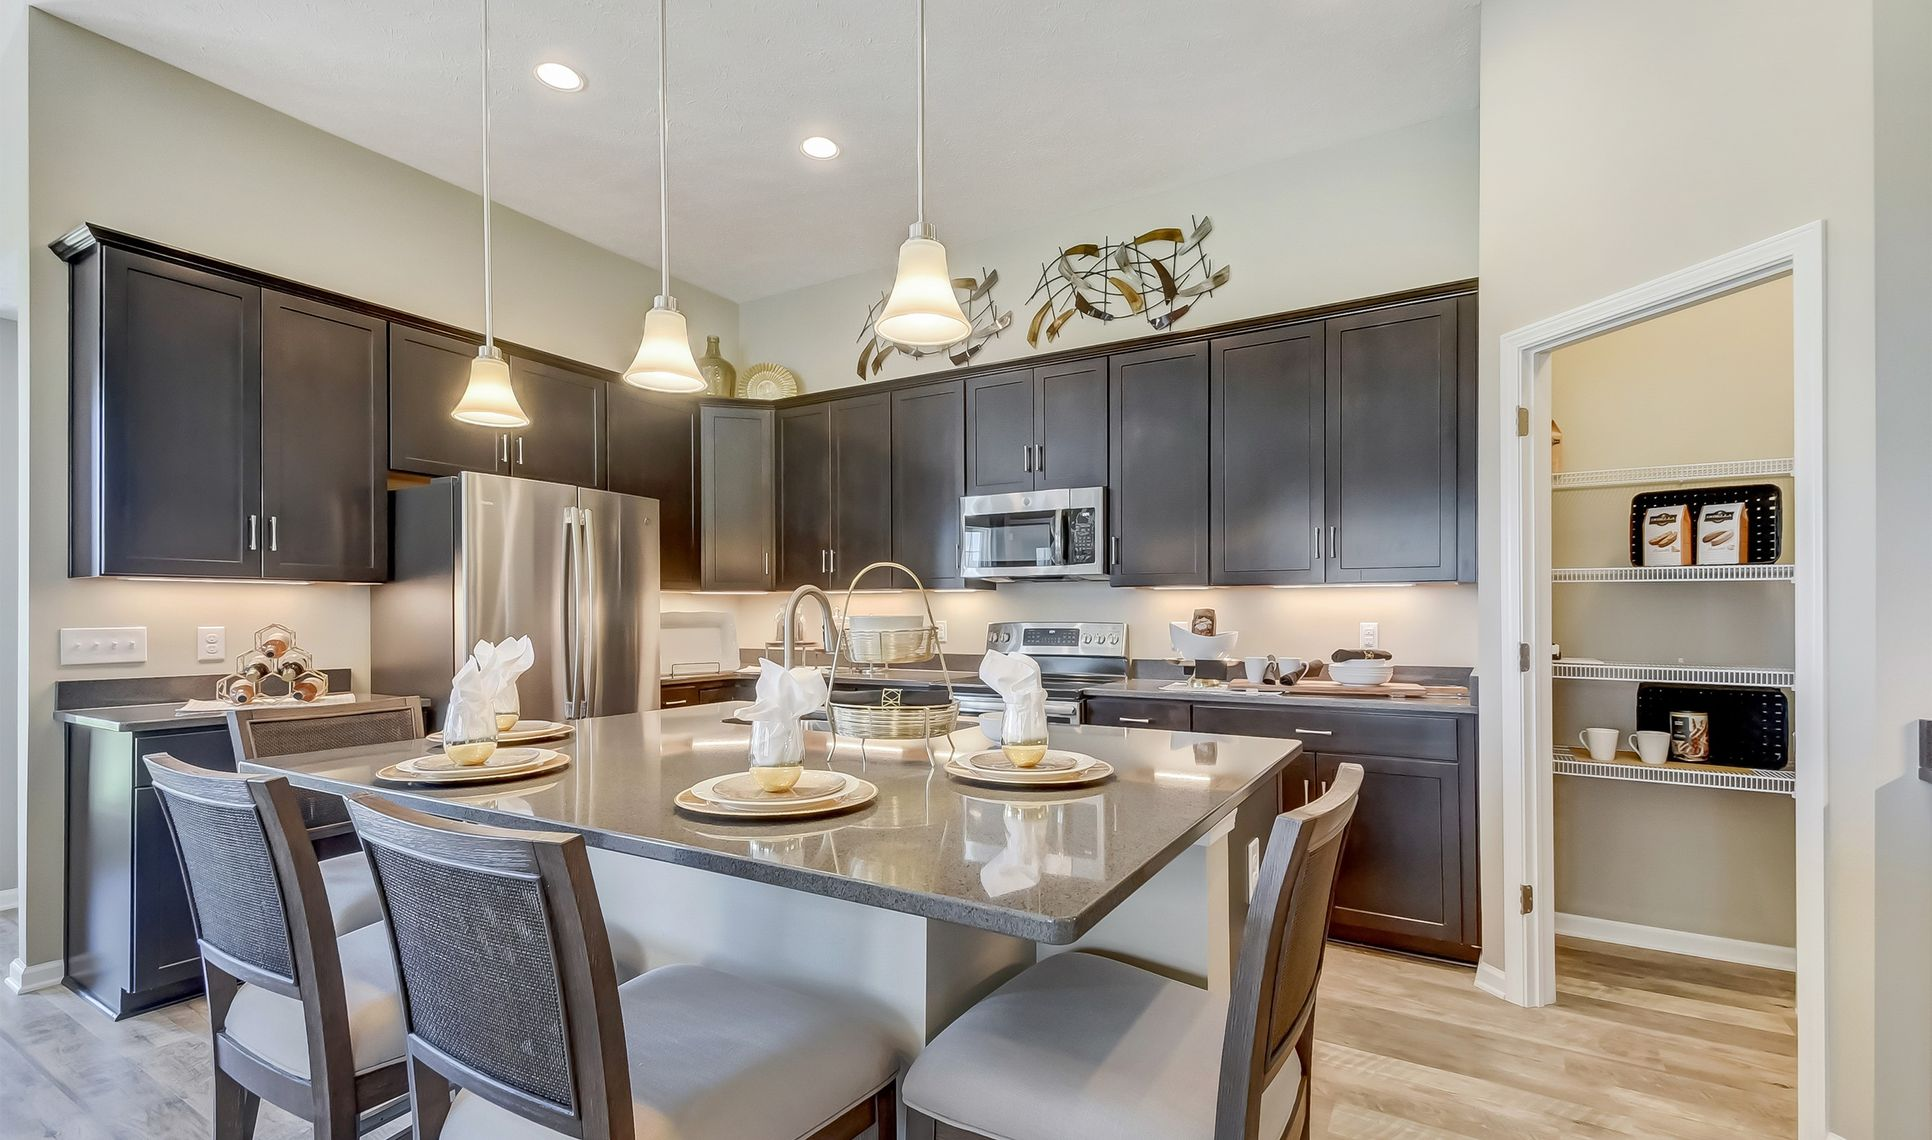 Interior:Stylish kitchen